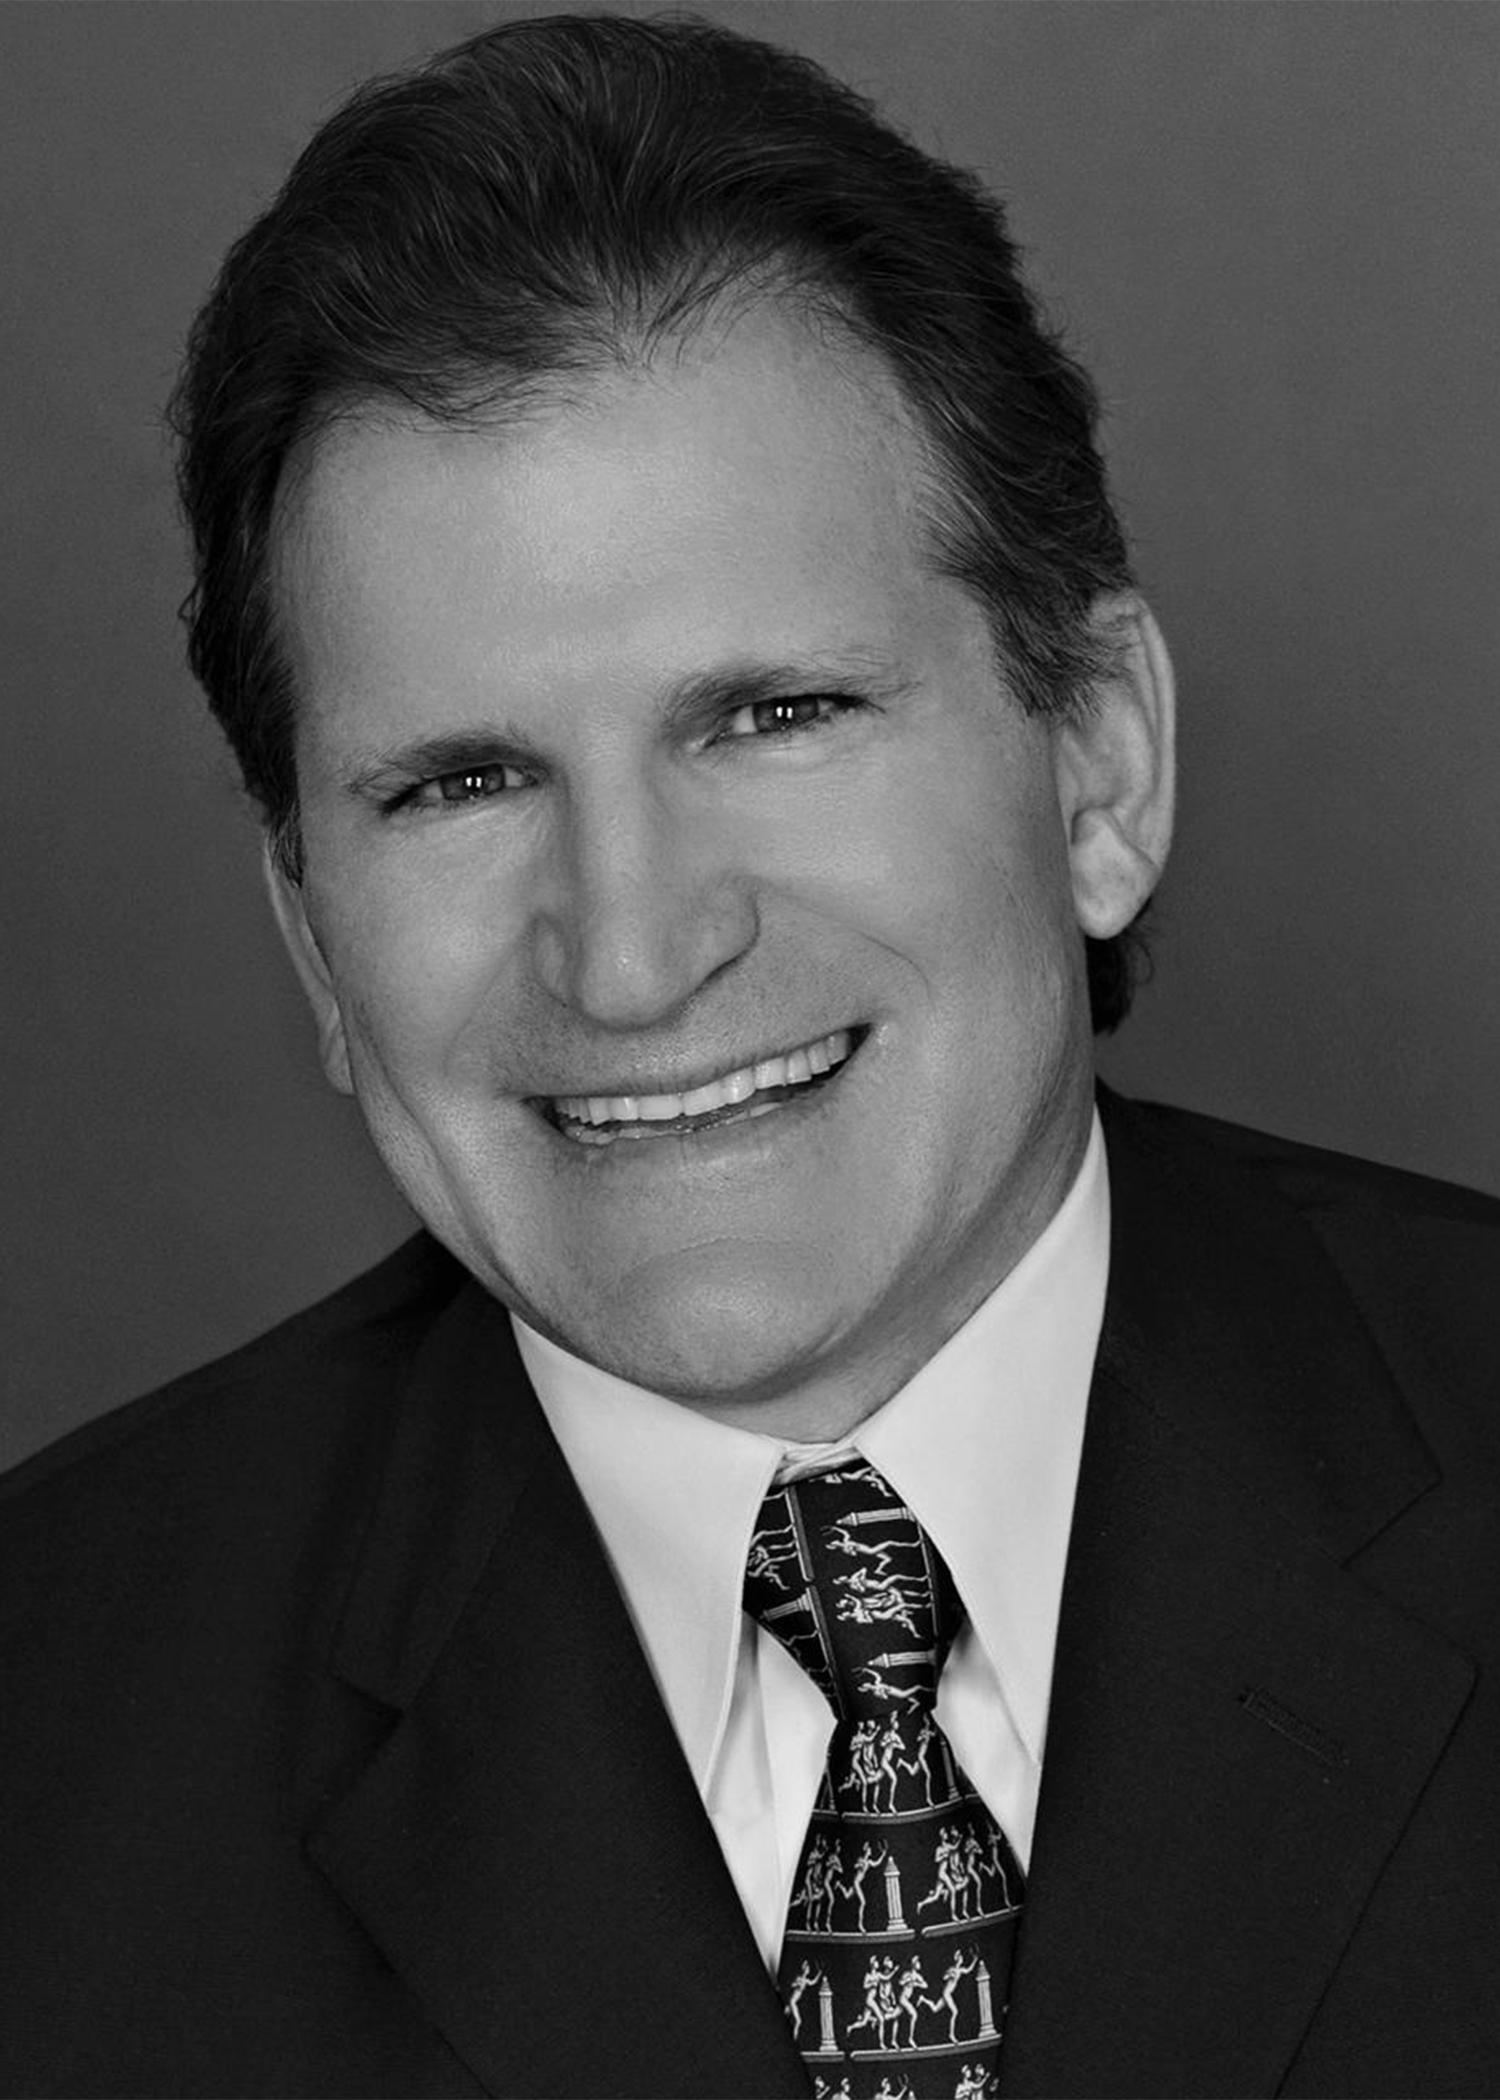 Jeffrey S. Gould Headshot